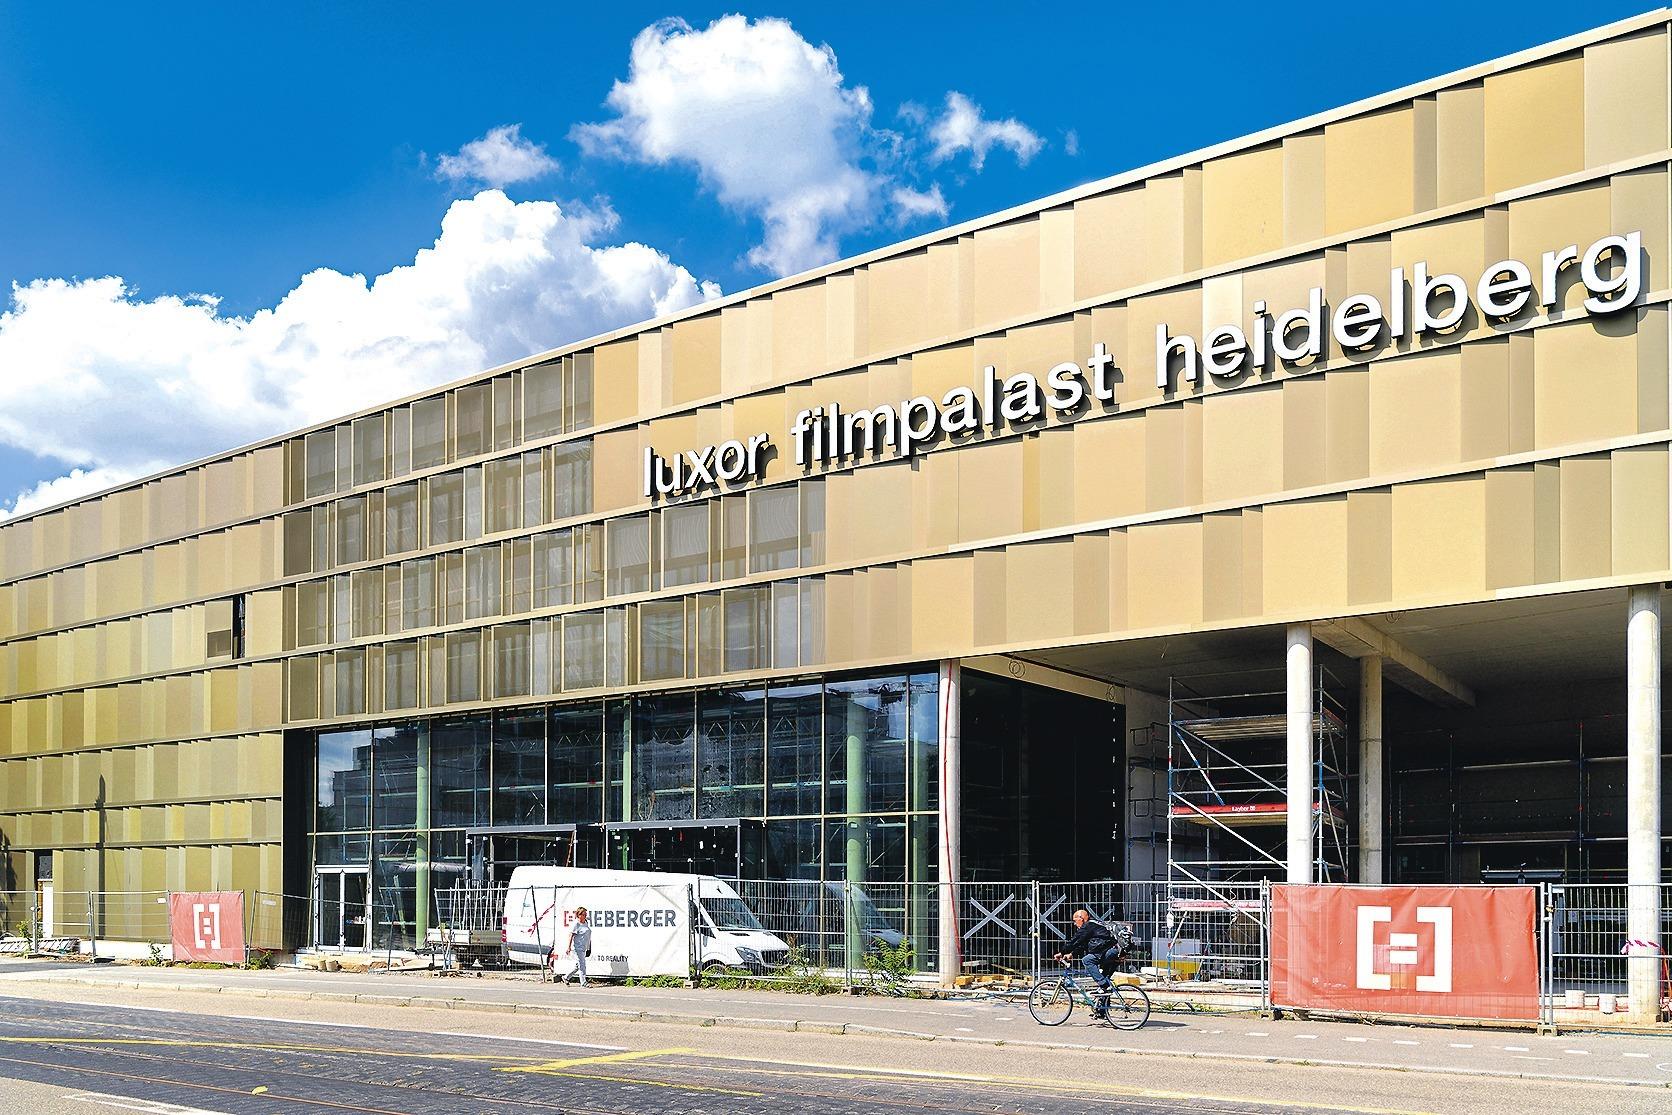 Heidelberg kino lux - babbnocnuhell